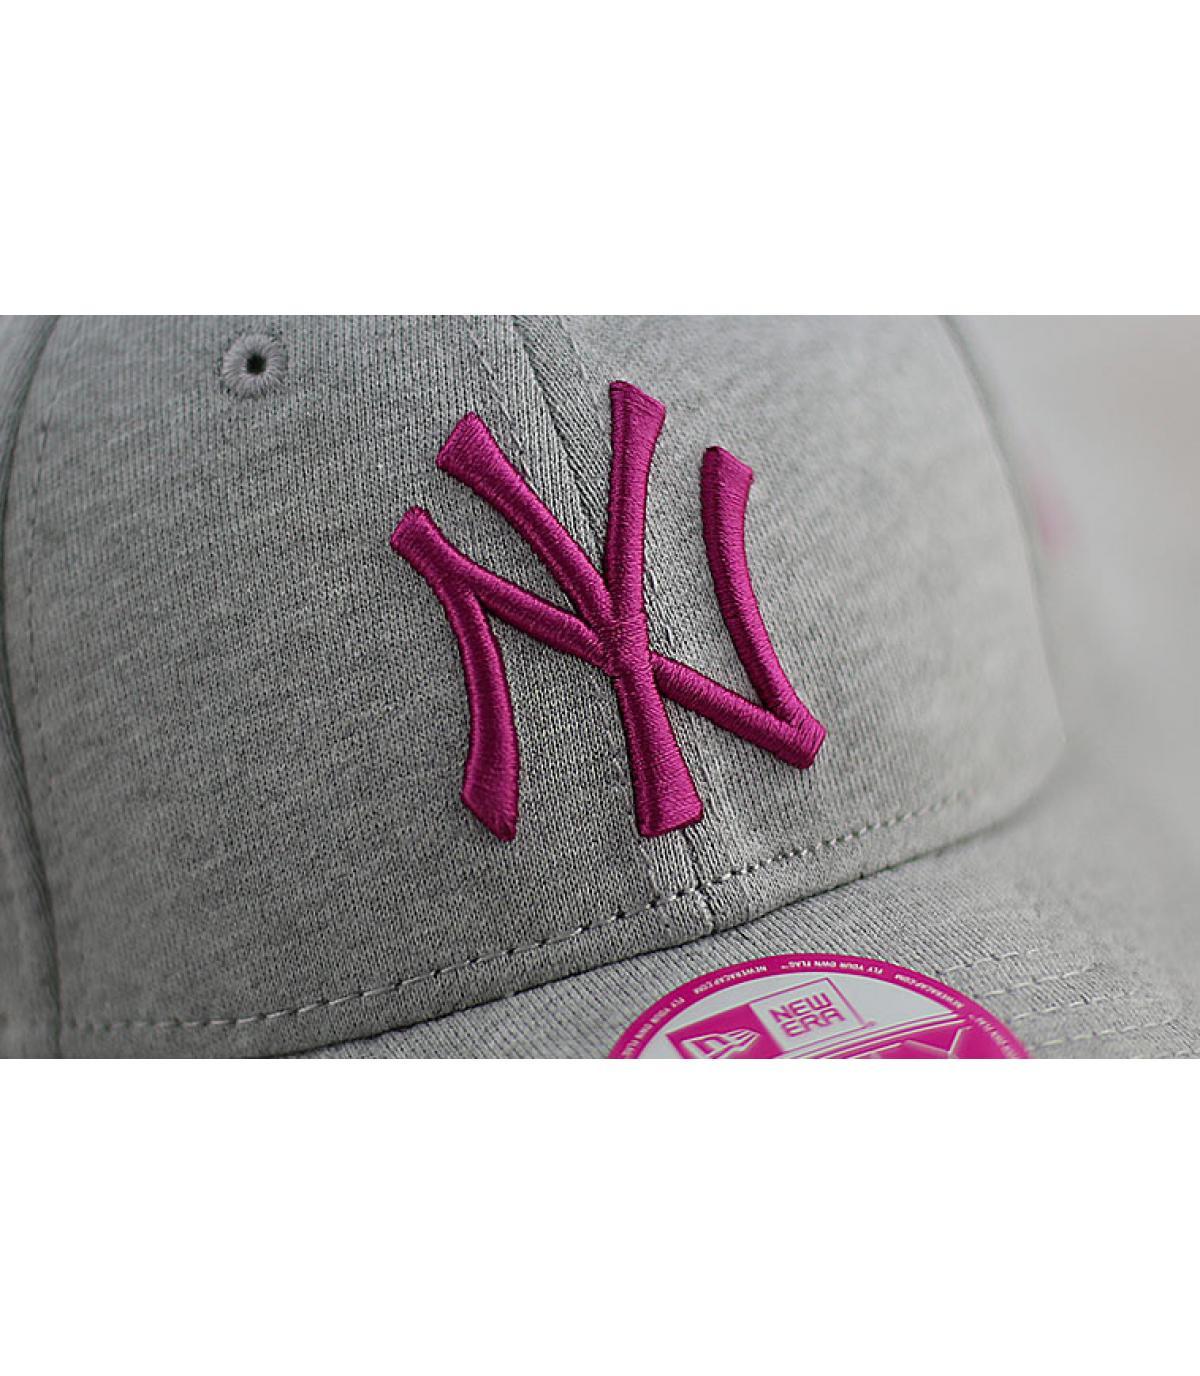 5c2a437261af4 Trucker mujer New Era rosa. Detalles Gorra mujer NY jersey 9forty gris rosa  imagen 4 ...